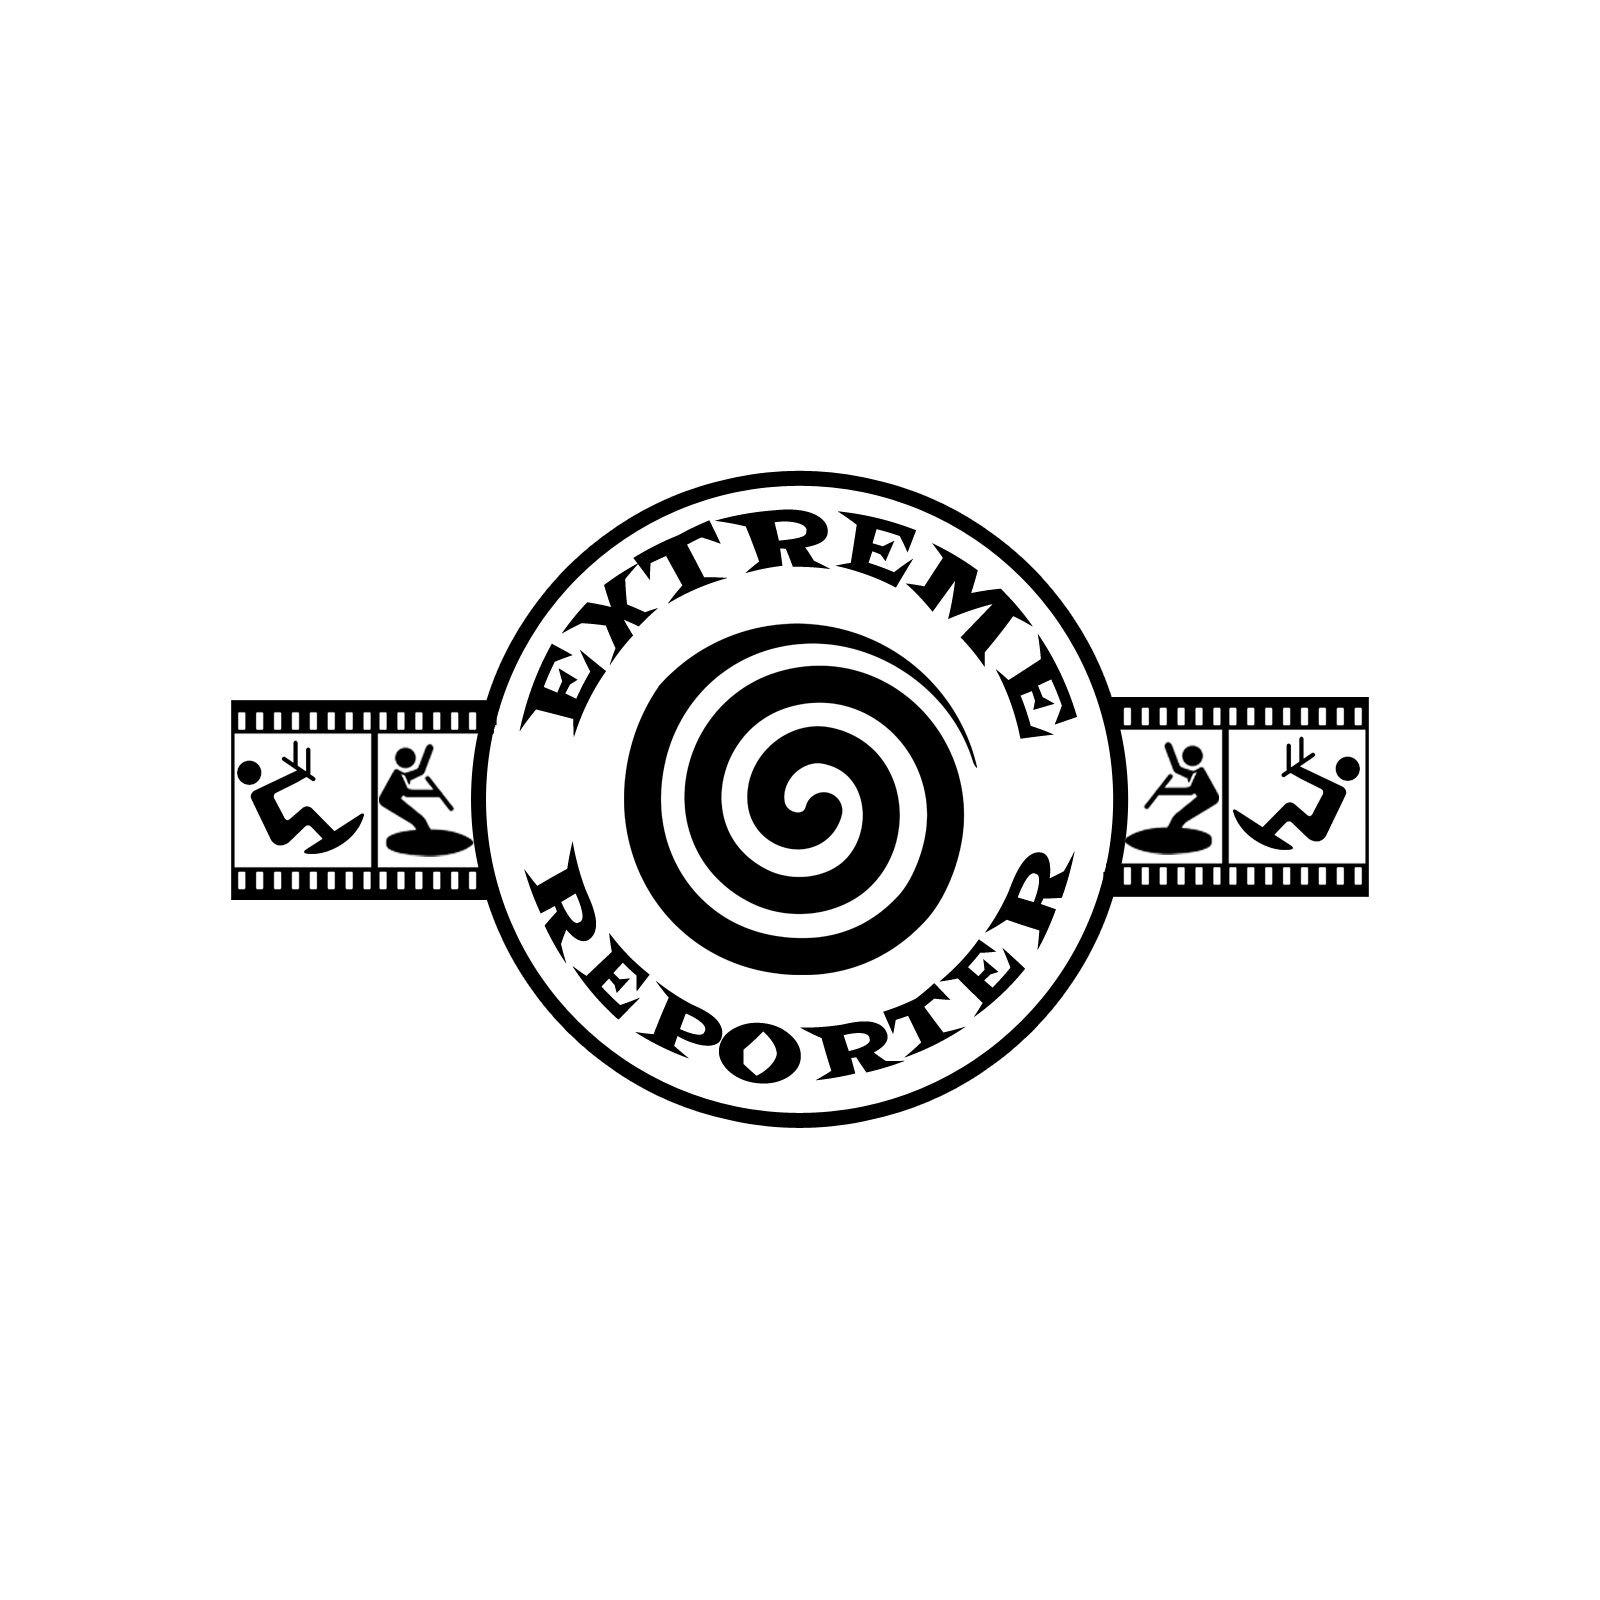 Логотип для экстрим фотографа.  фото f_3495a526e59004d8.png